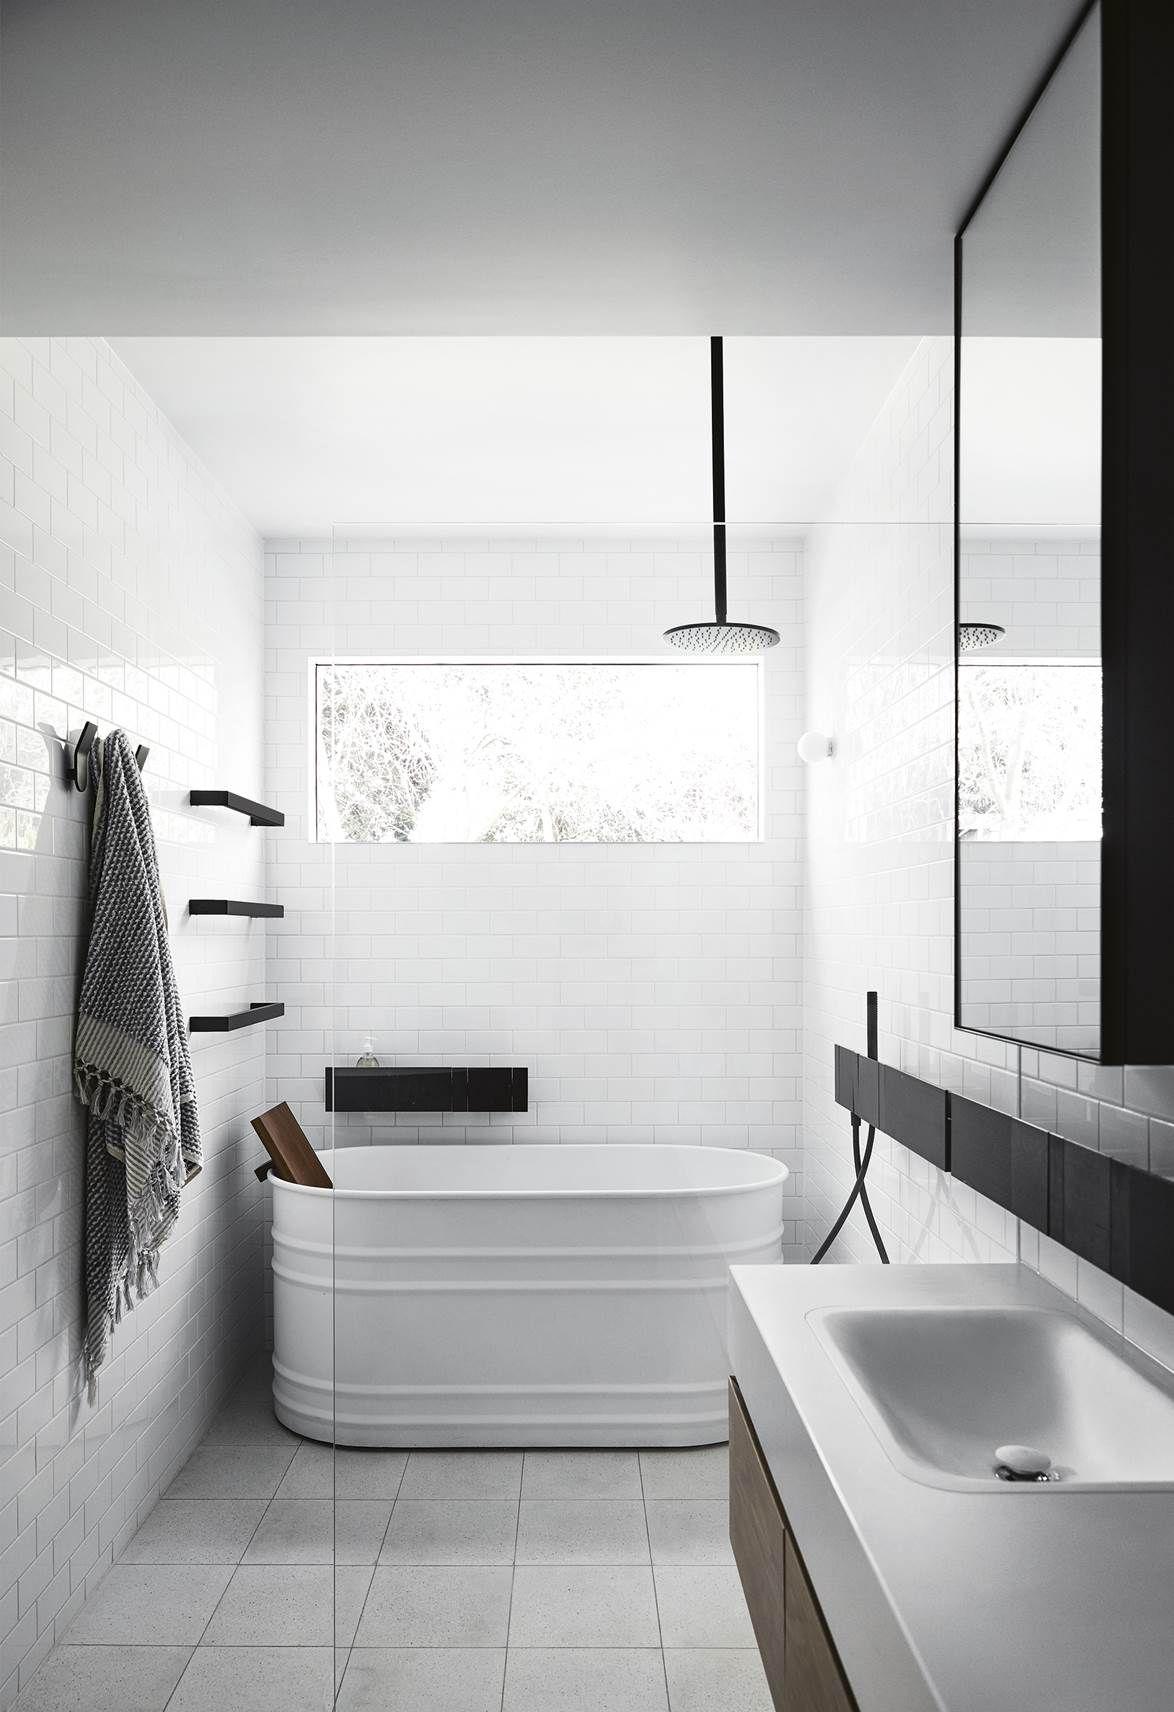 Moderne zen badezimmerideen  bathroom ideas that will transform your zen space  bath